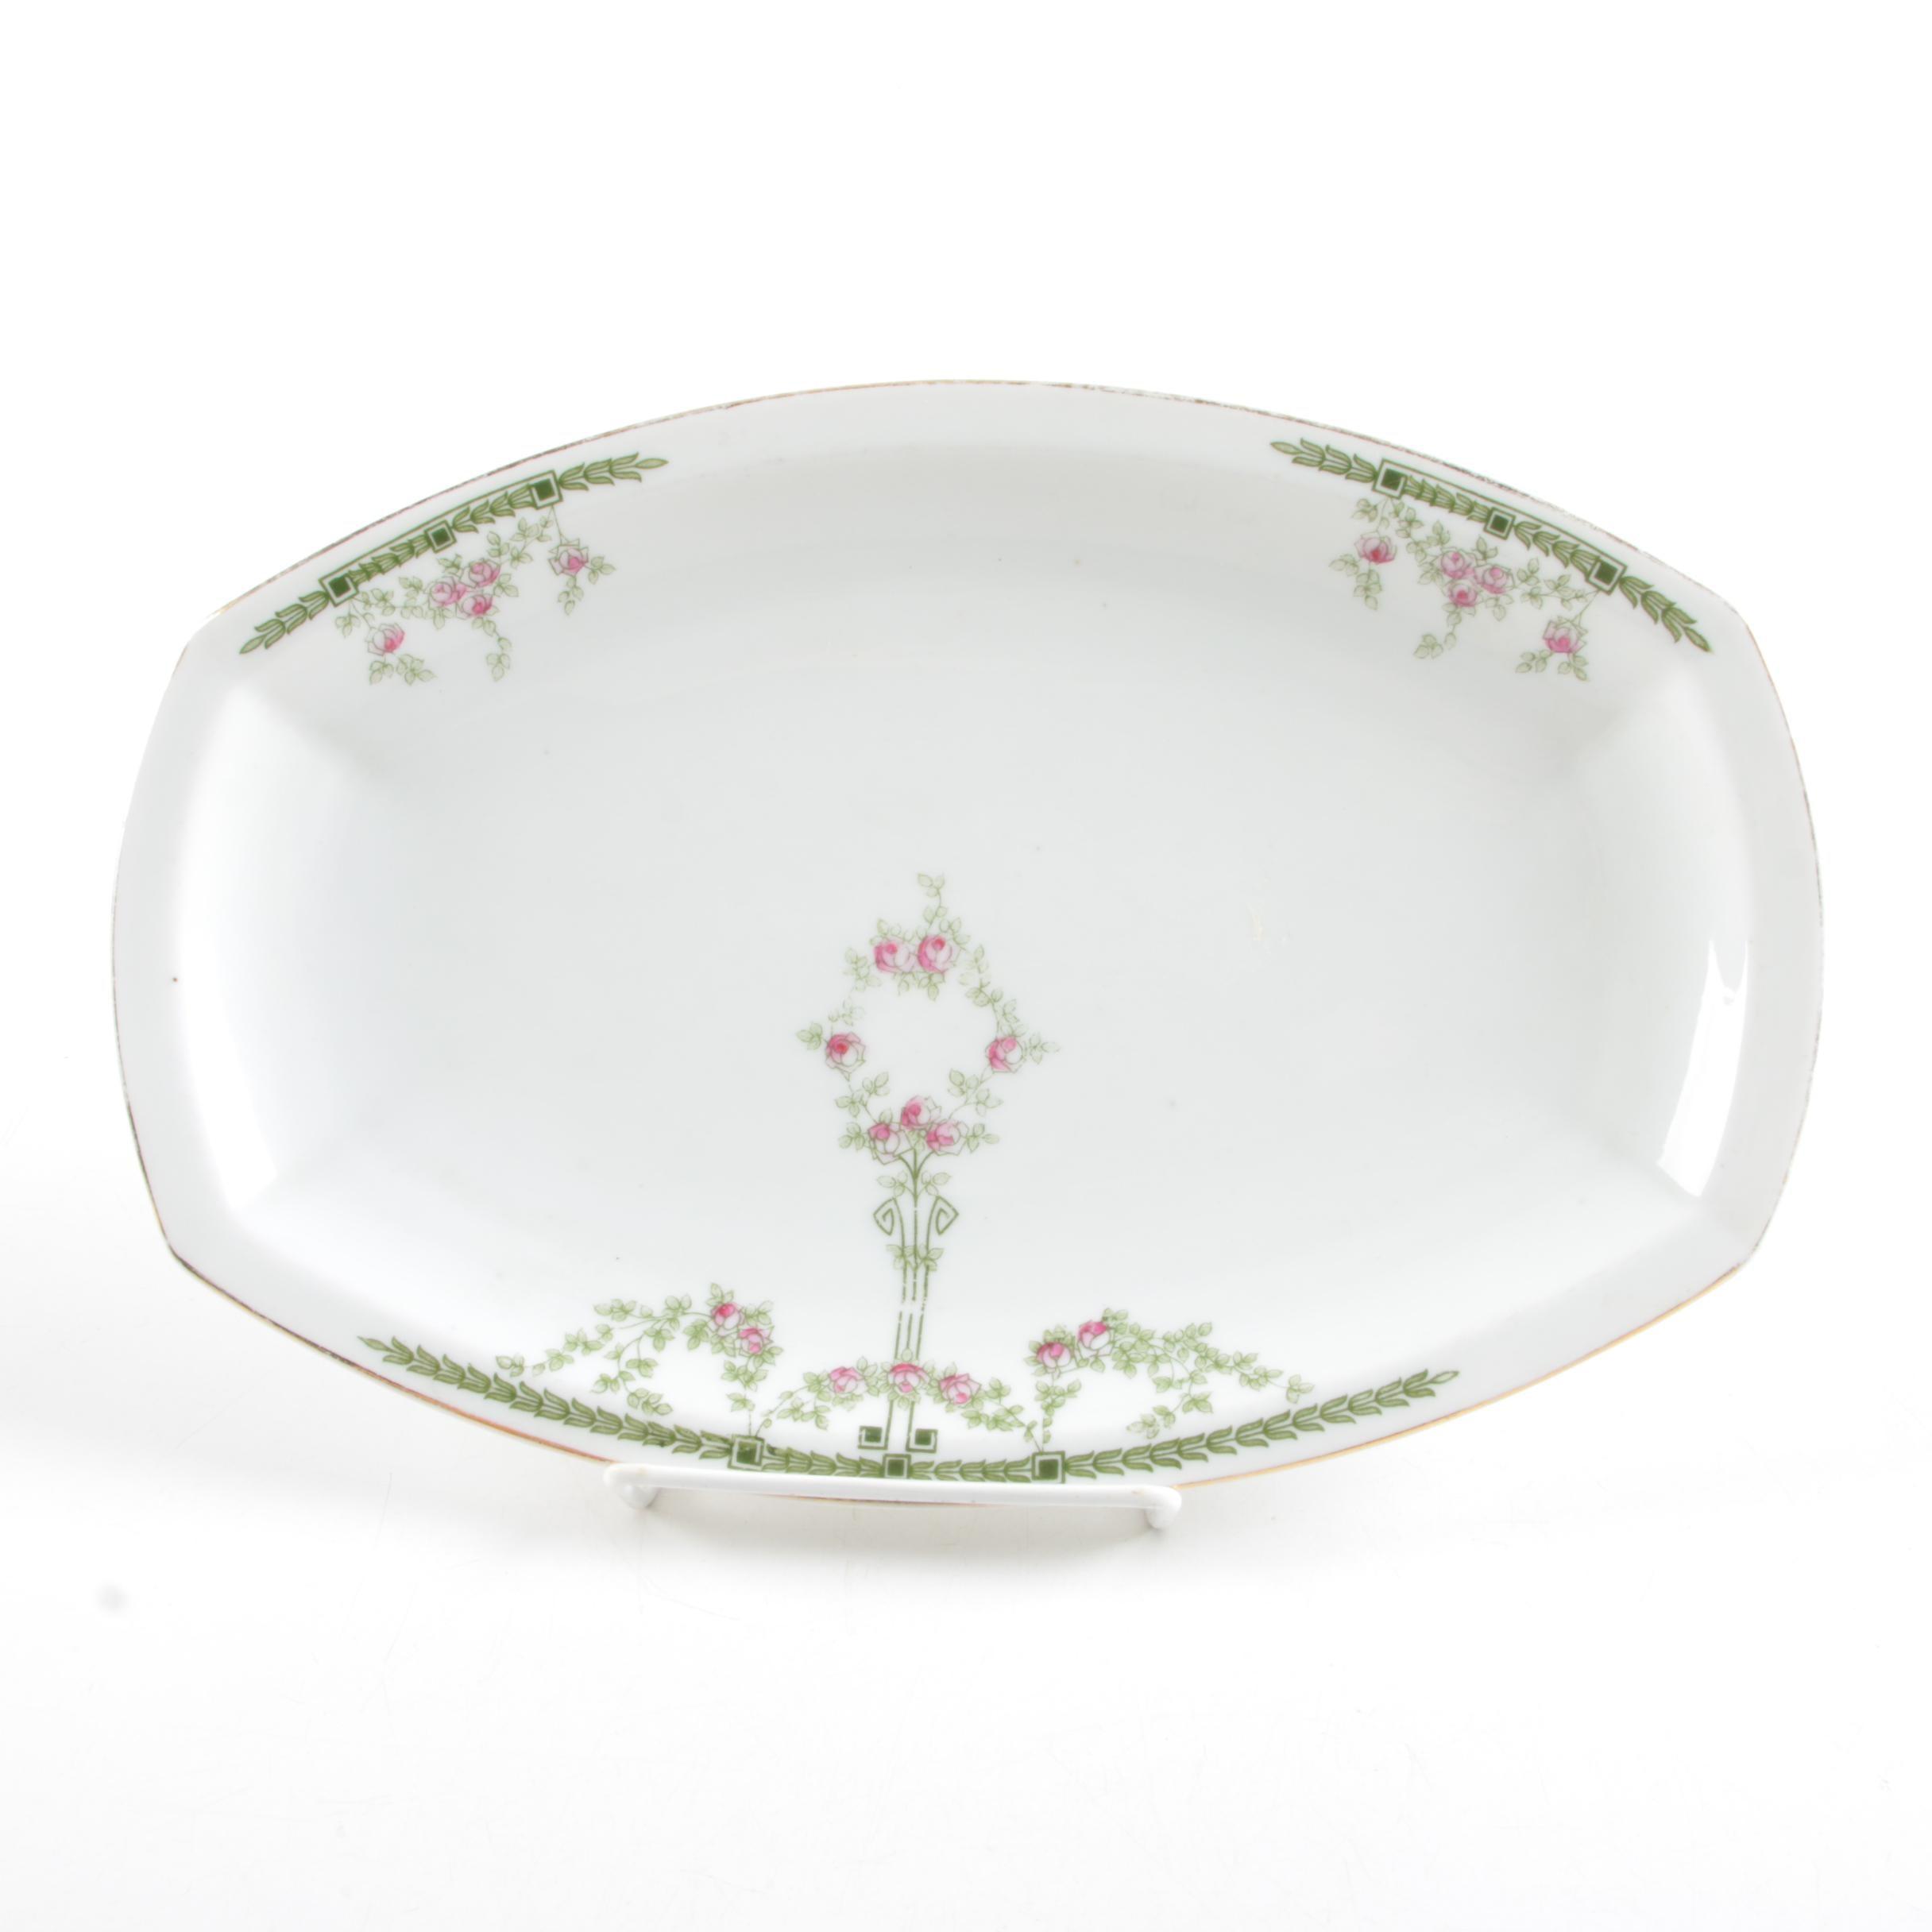 Heinrich & Co. Porcelain Oval Platter, Circa 1930-1939